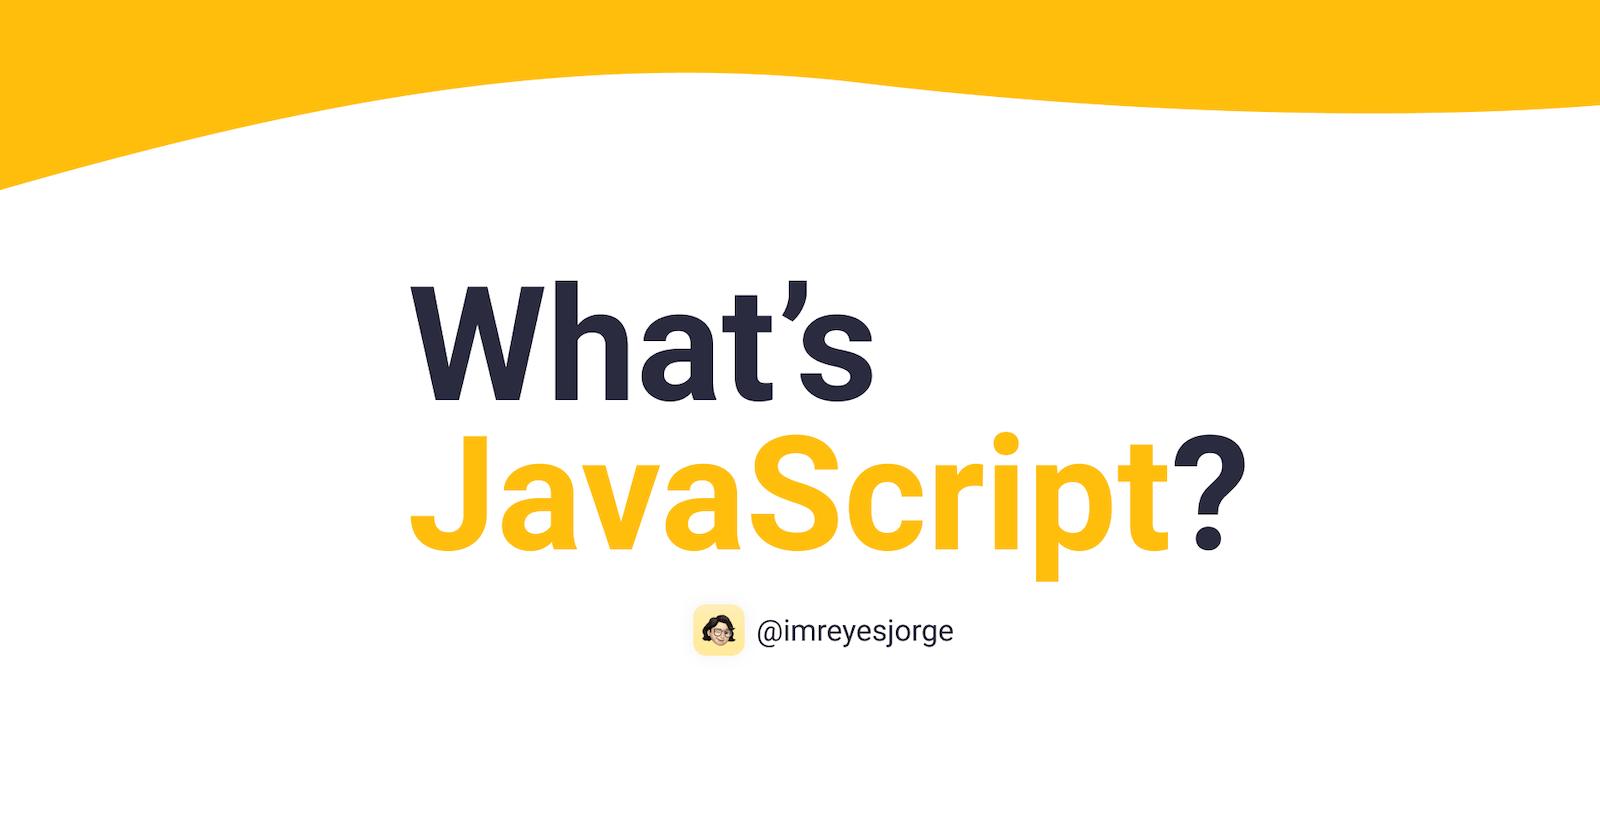 What's JavaScript?